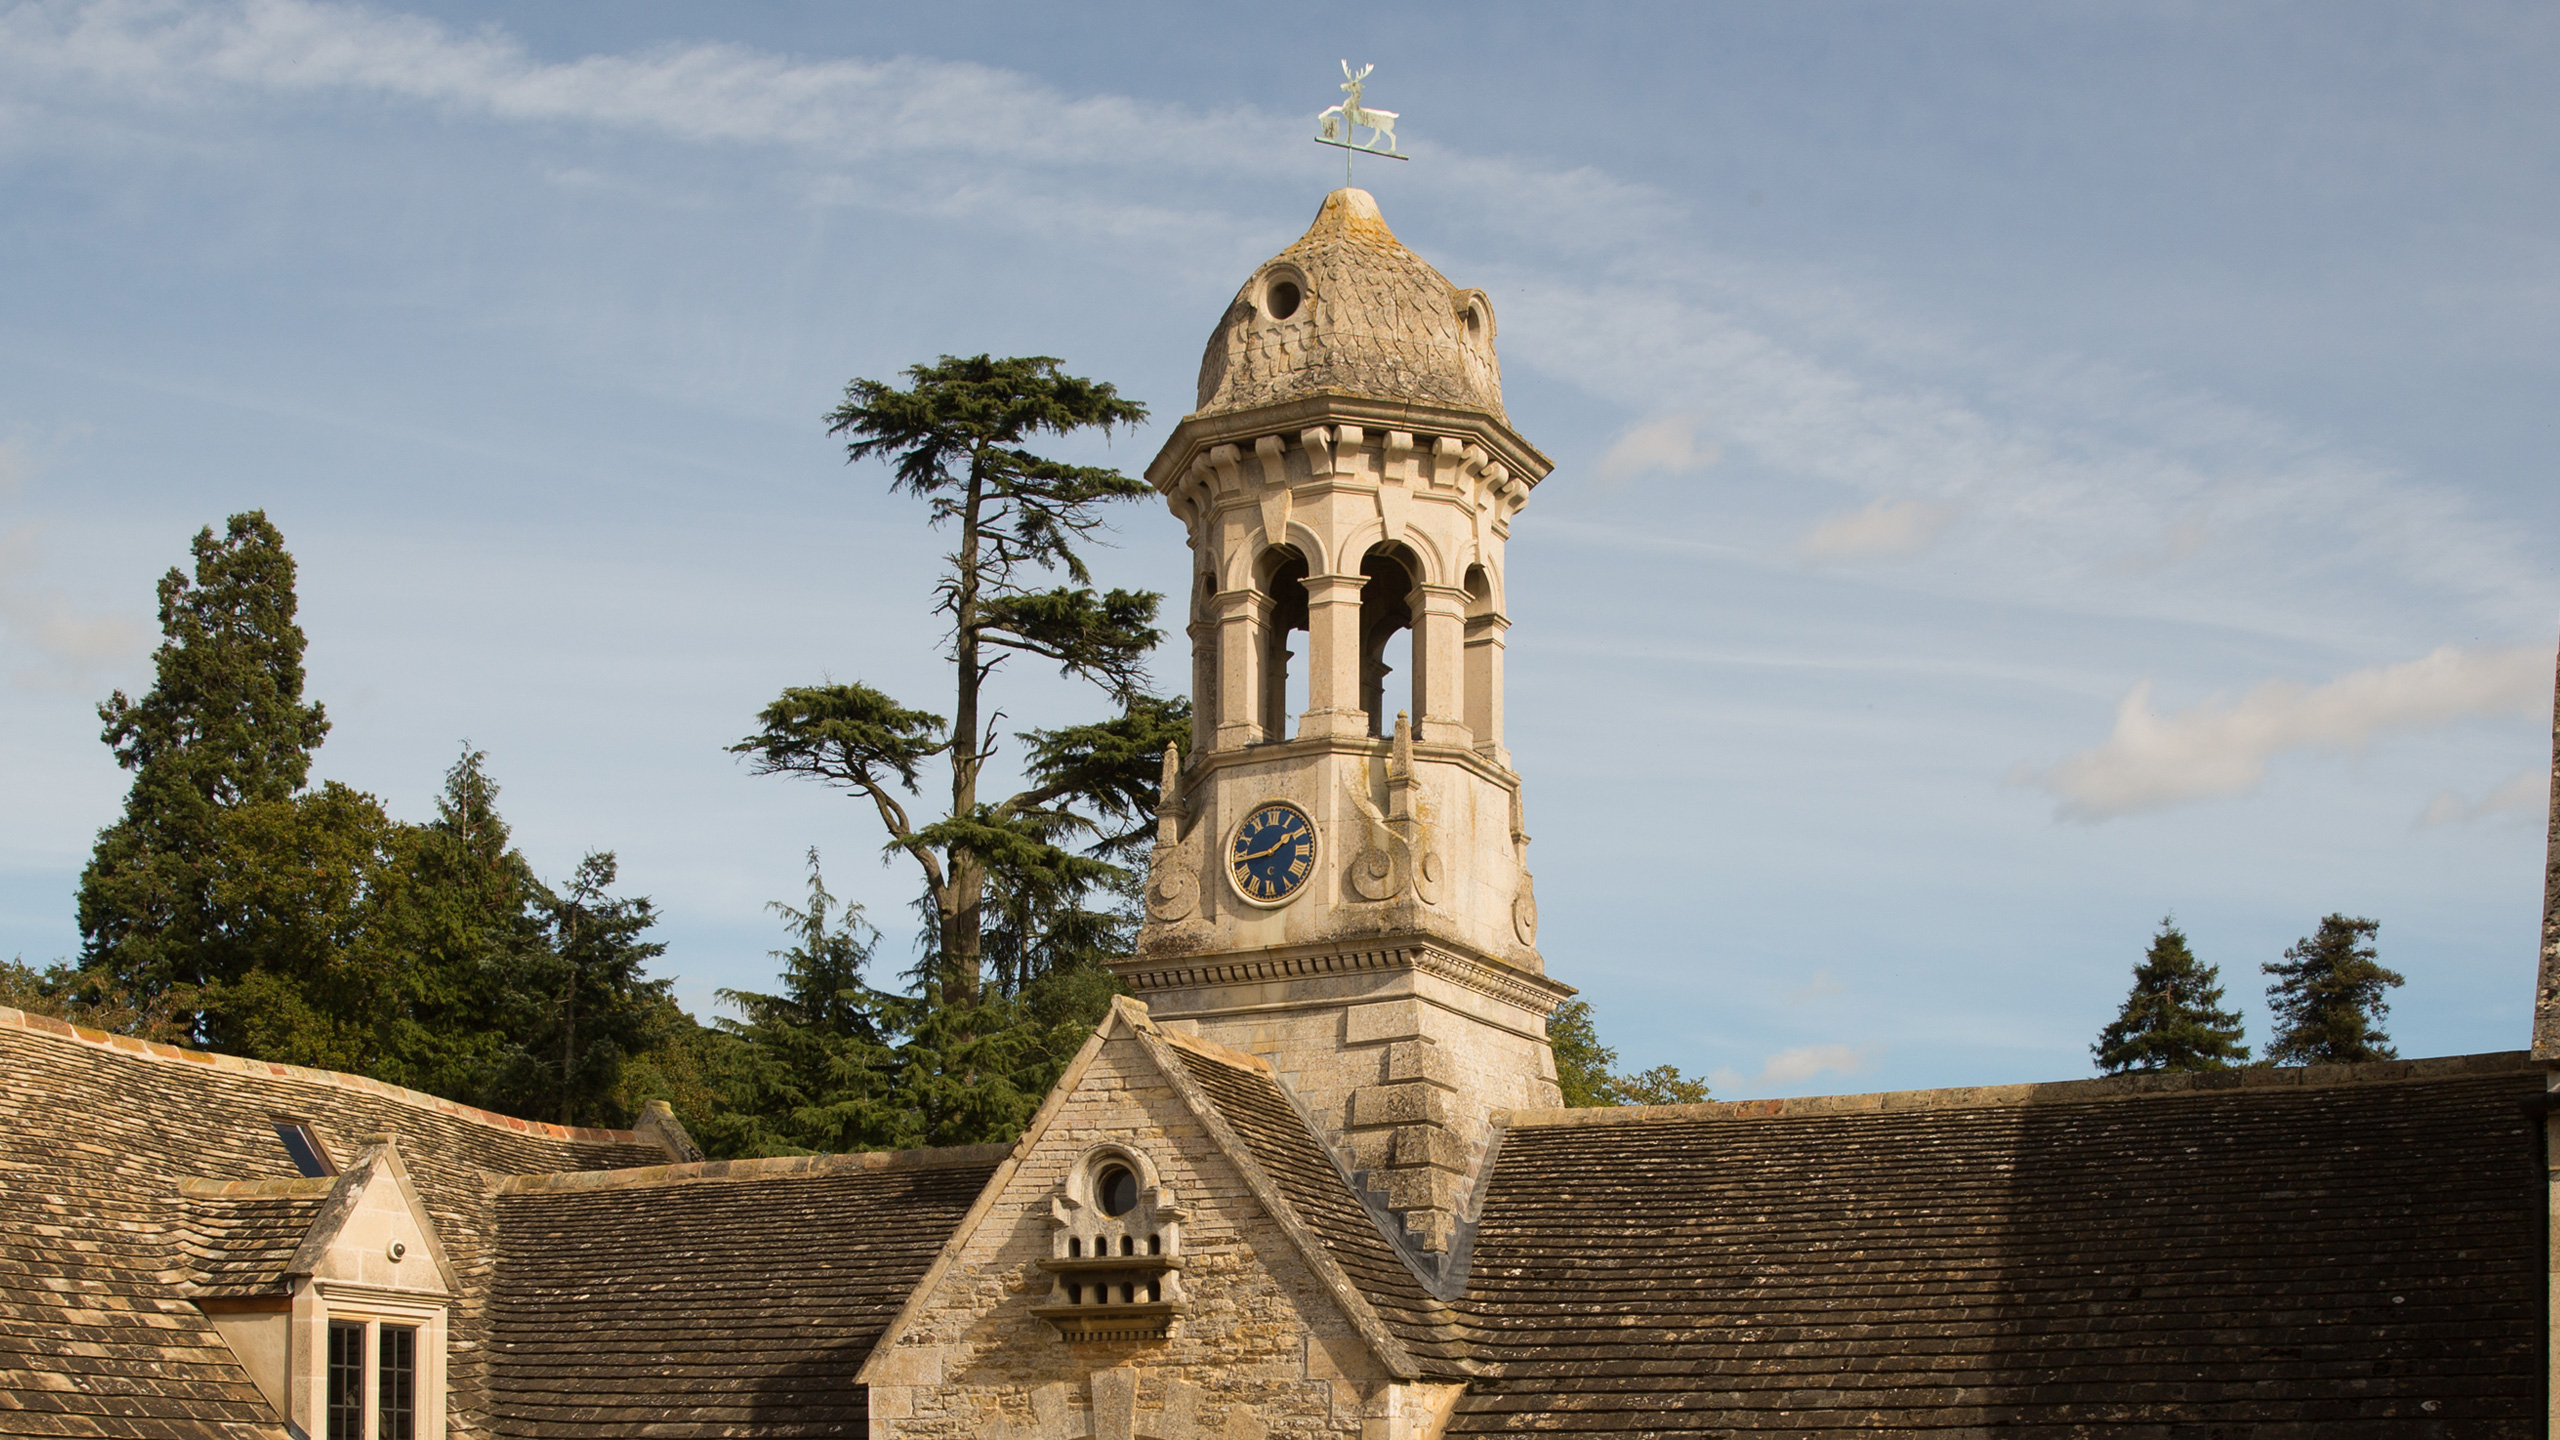 Lyndon Hall, Clock Tower